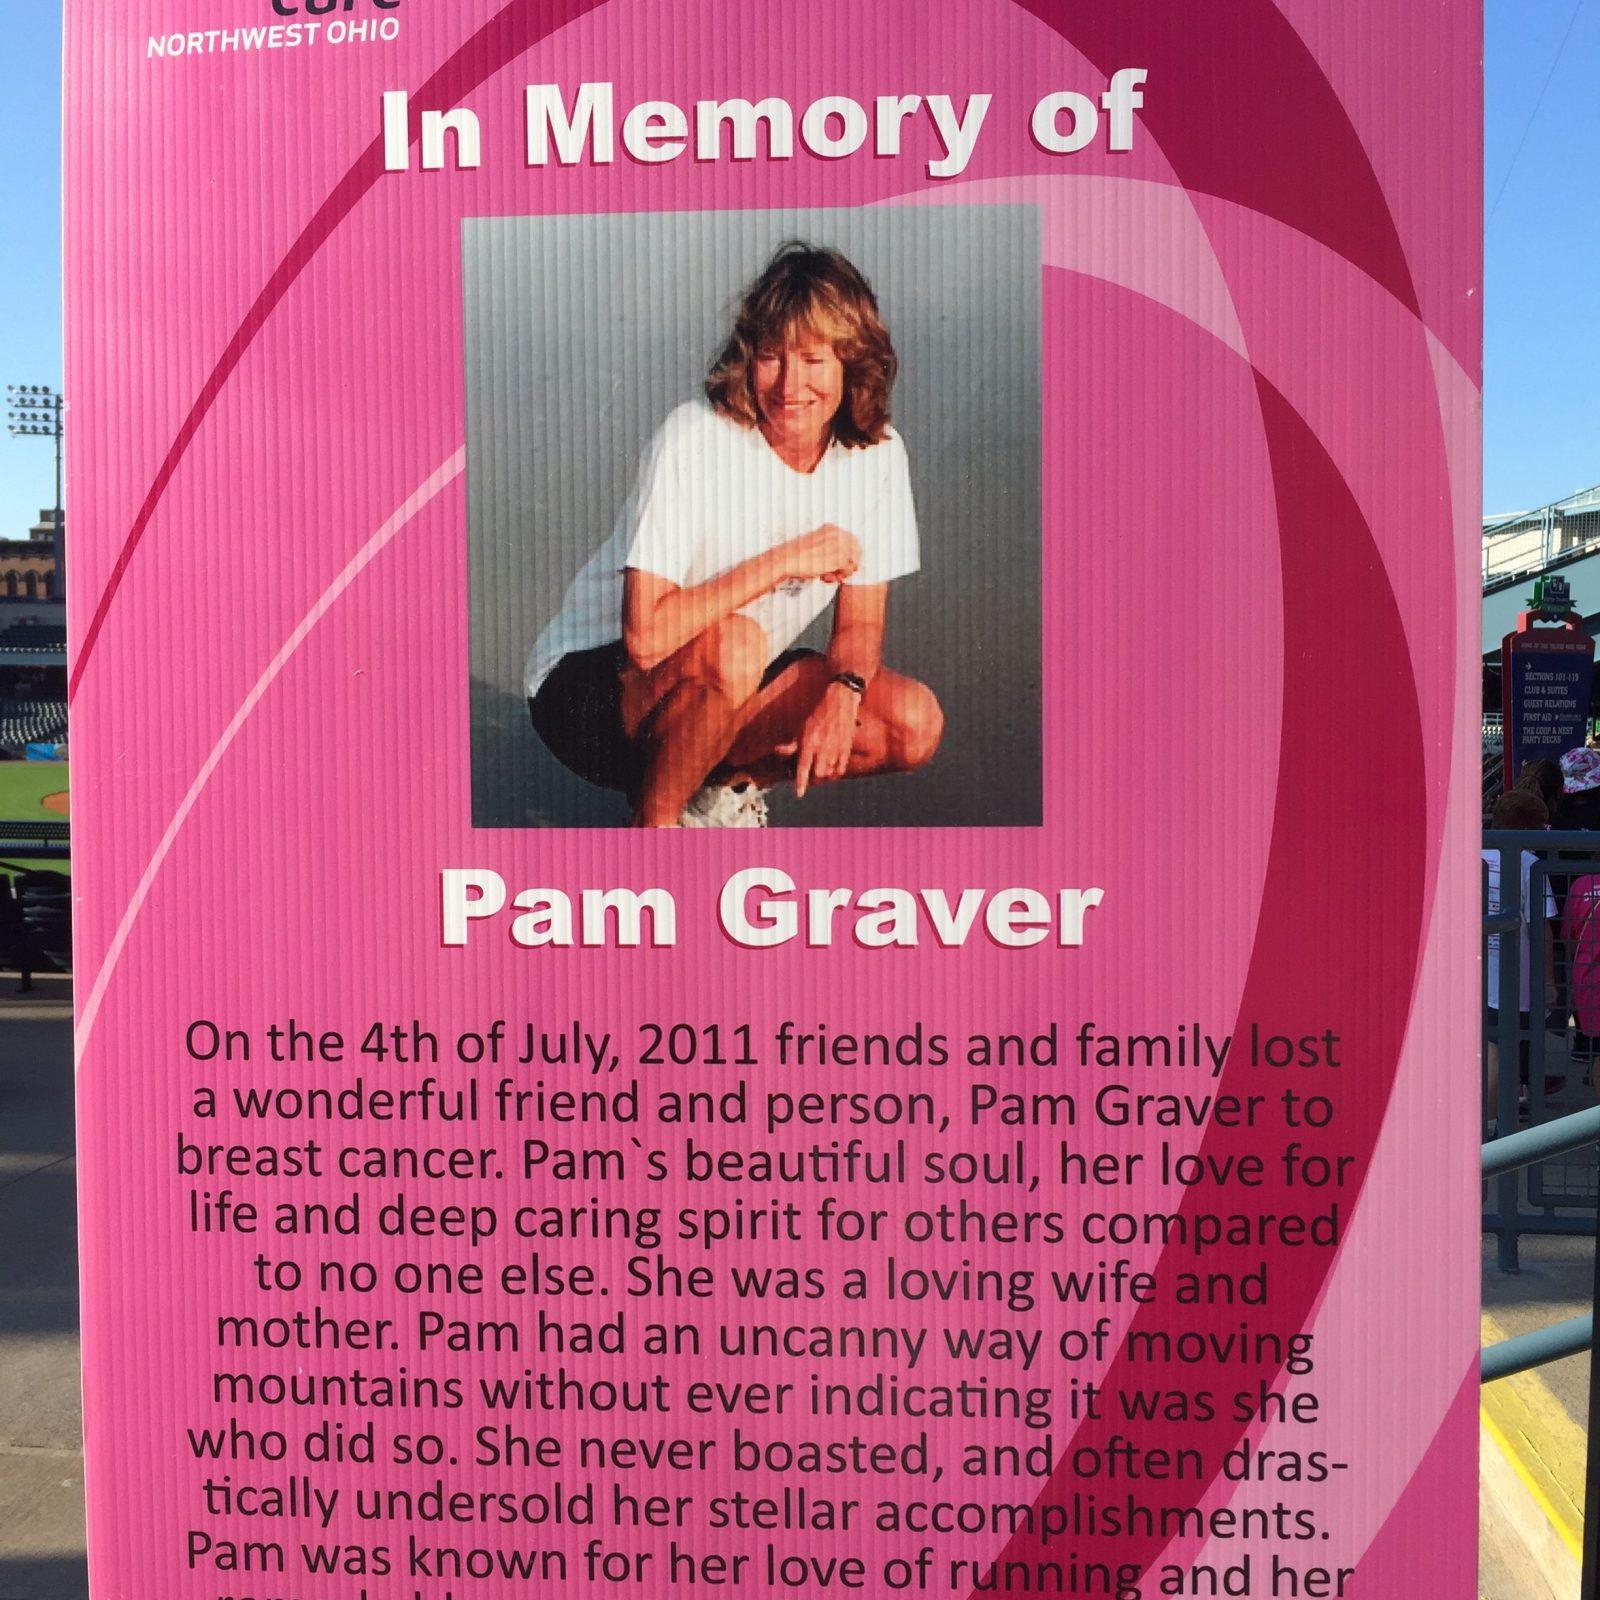 Pam Graver